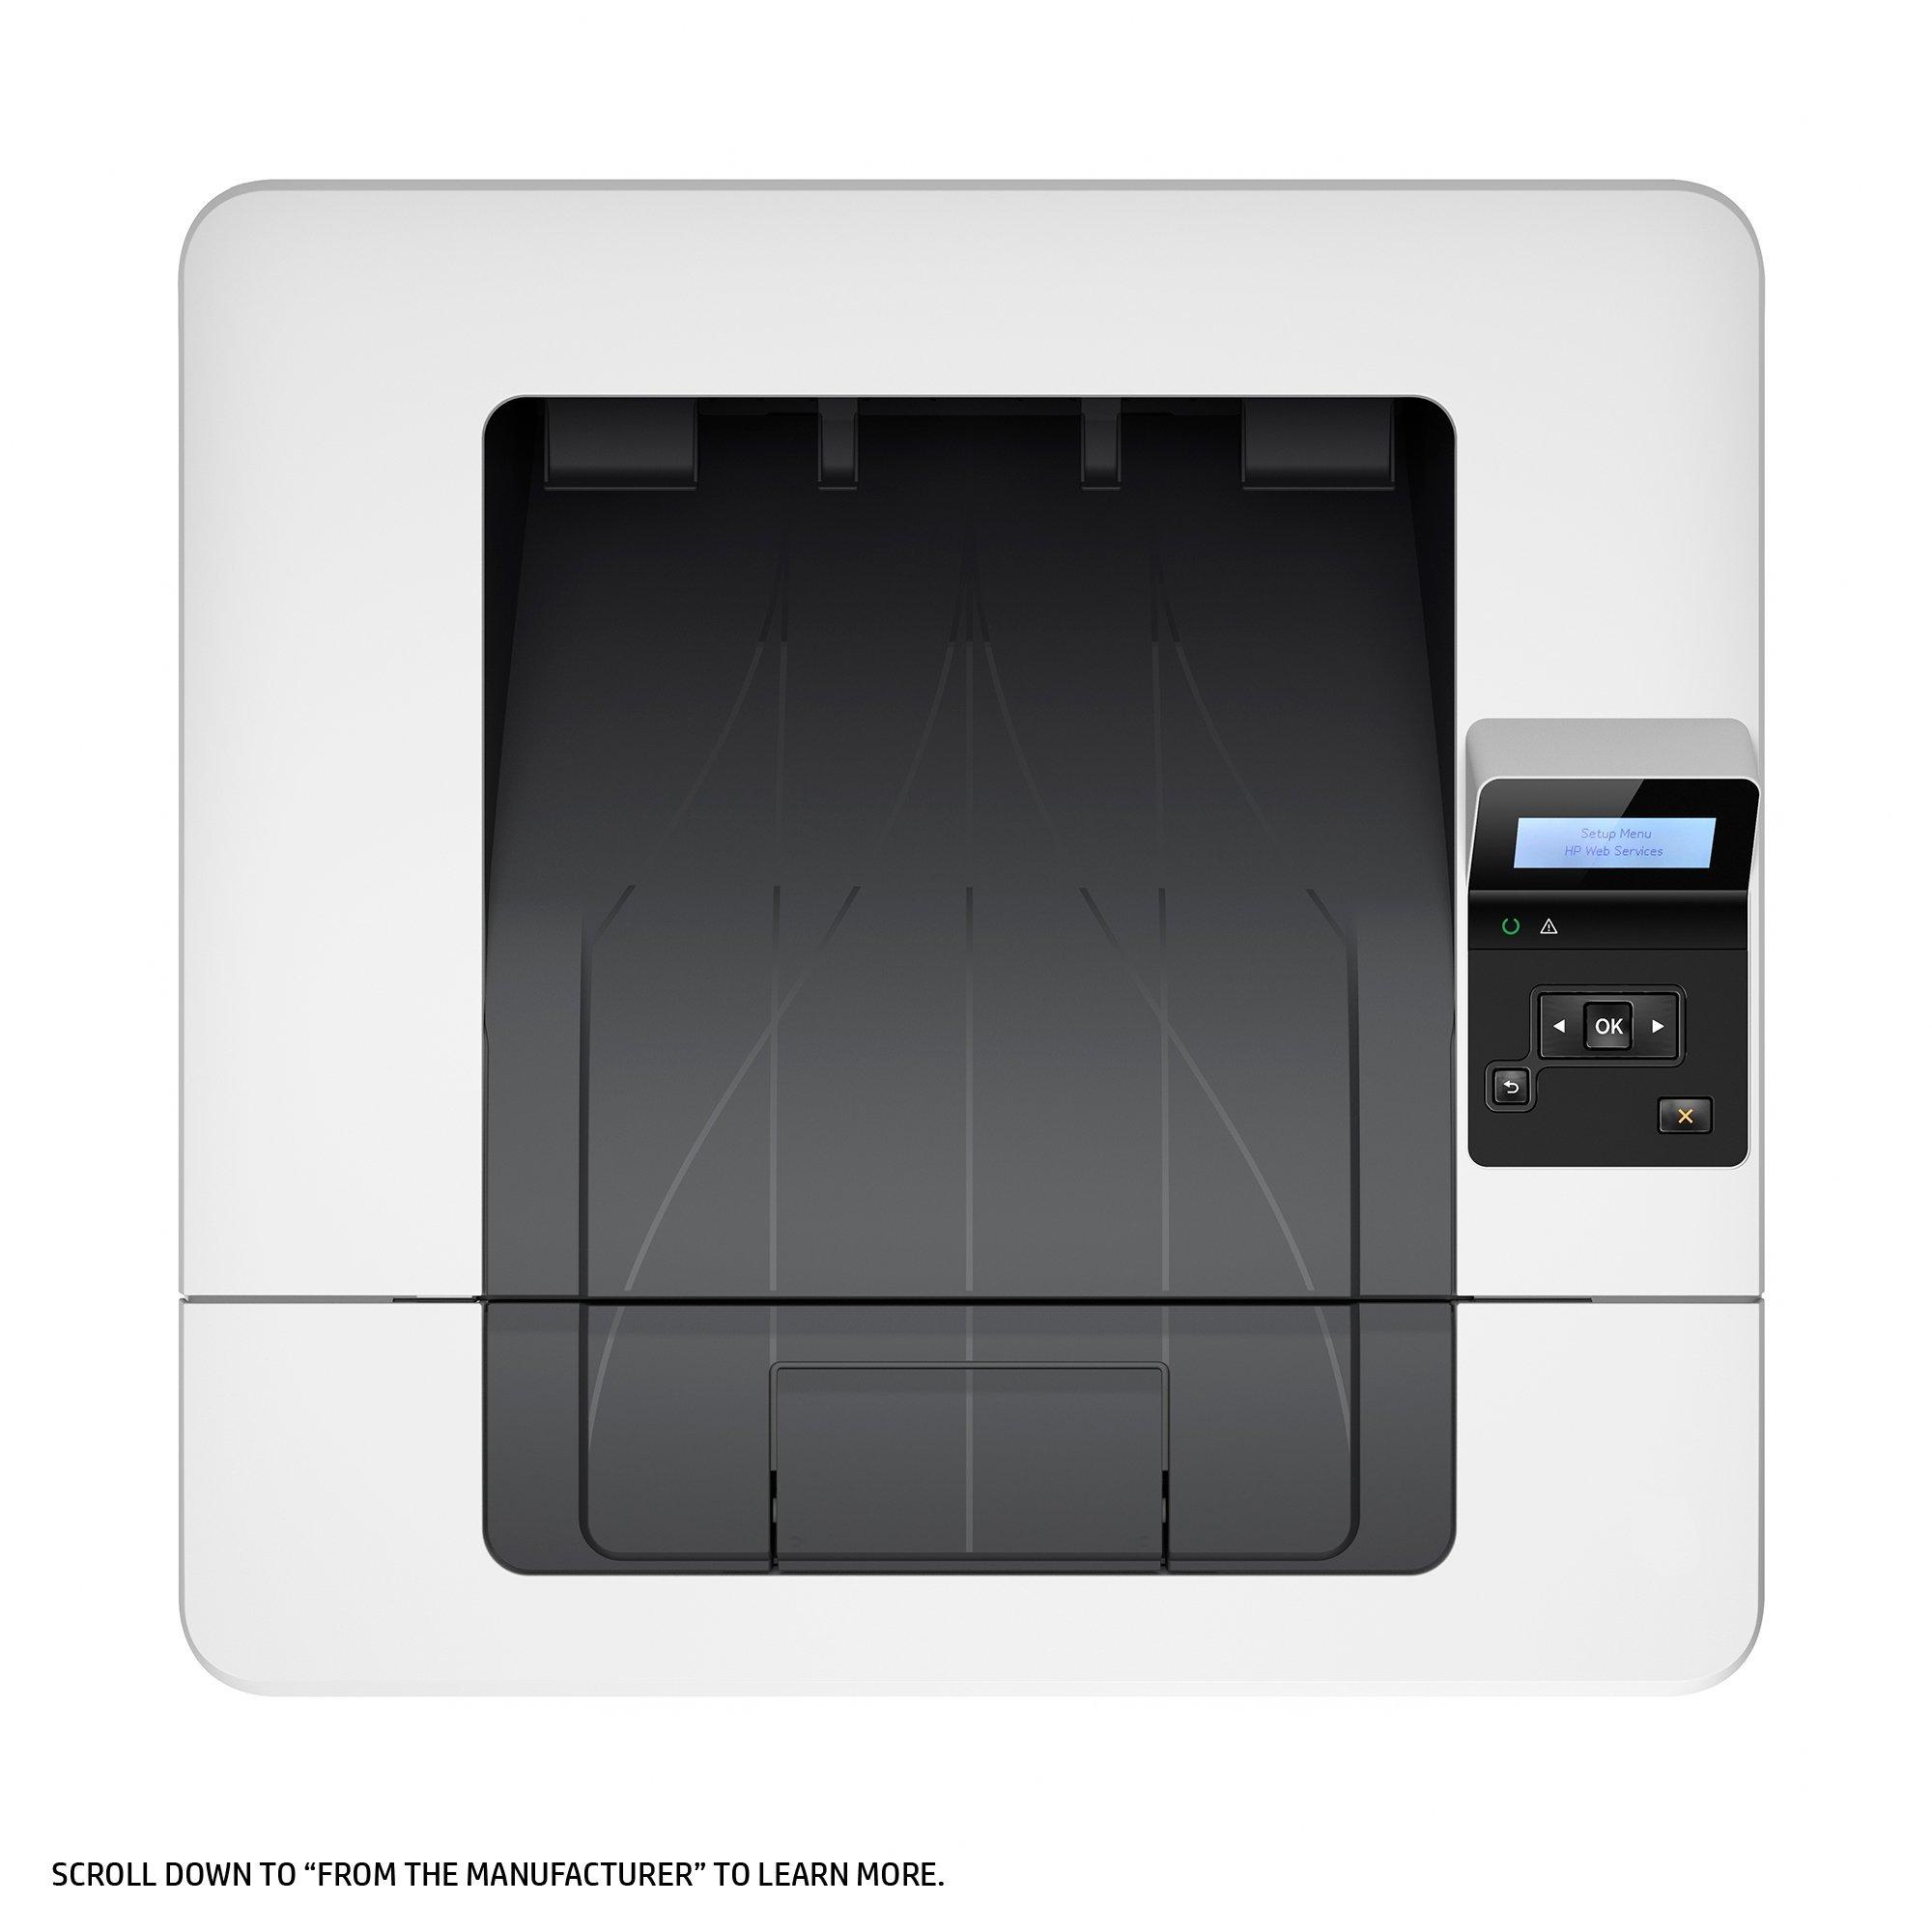 HP Laserjet Pro M402n Monochrome Printer, (C5F93A) (Renewed) by HP (Image #8)